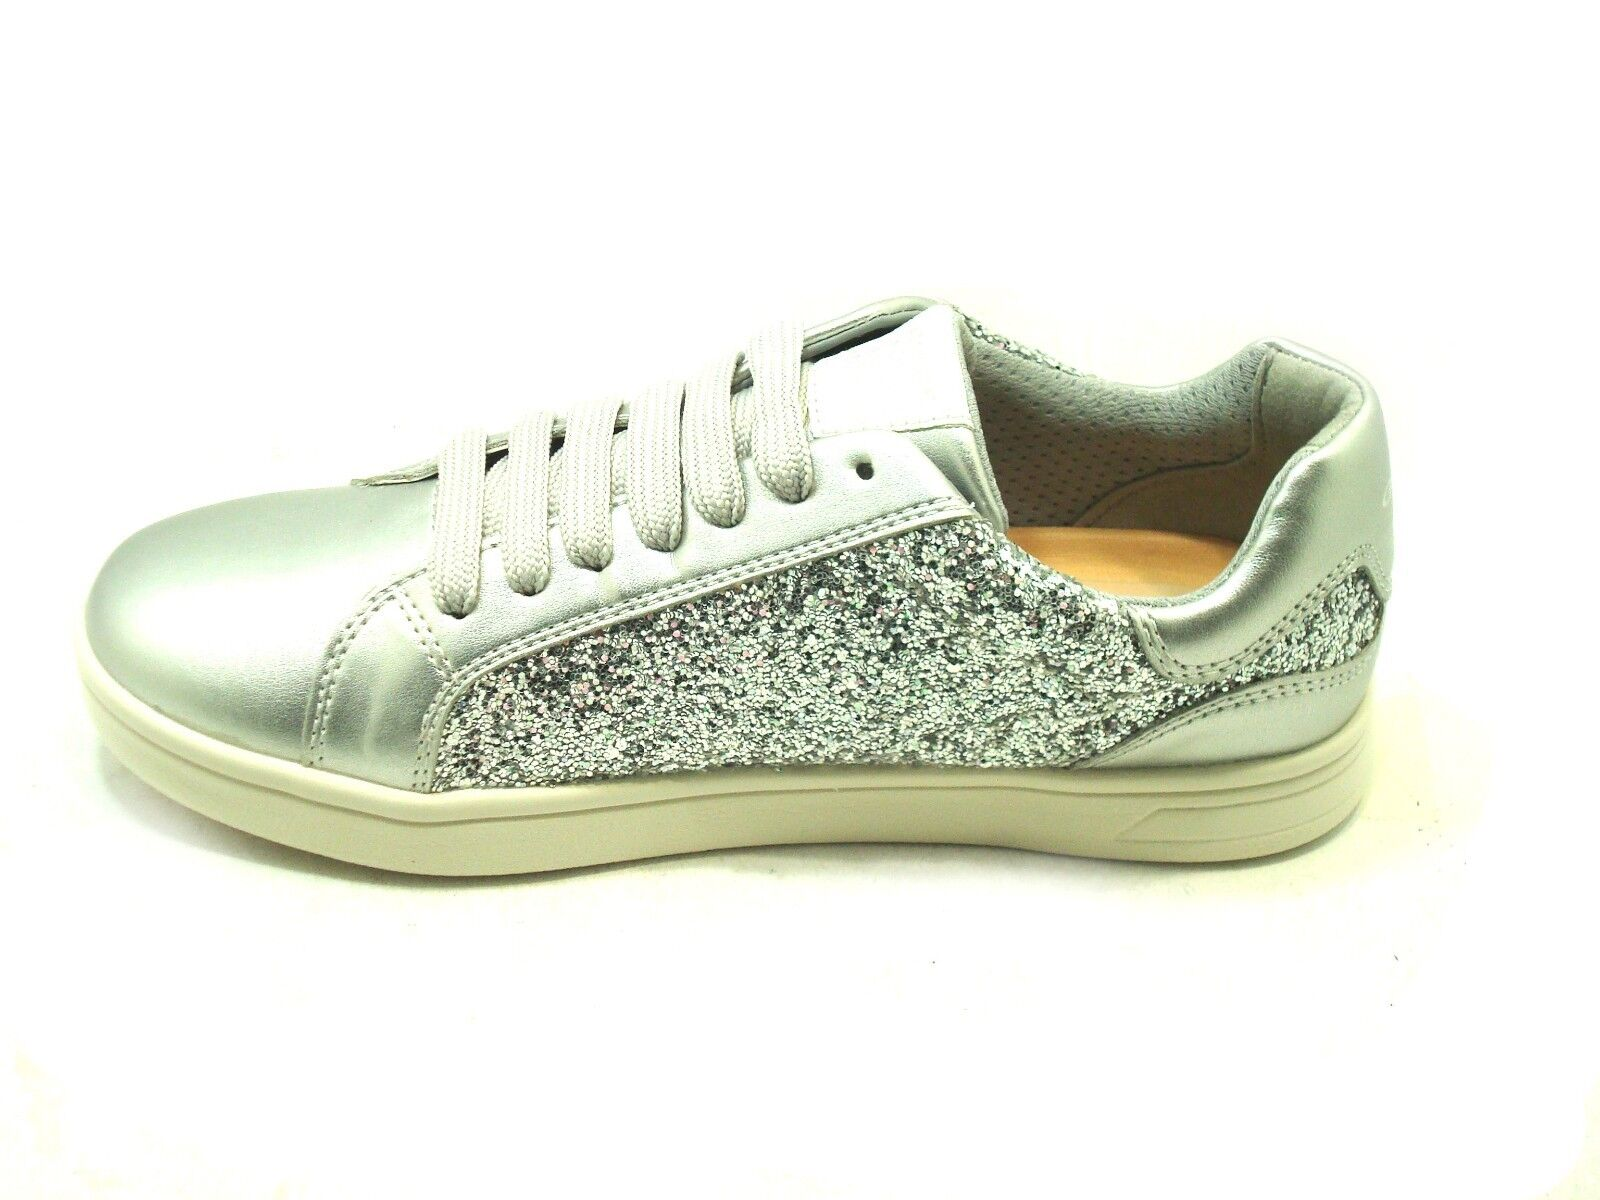 Scarpe da Ginnastica Basse Bambina Sneakers GEOX Scarpe classiche da uomo